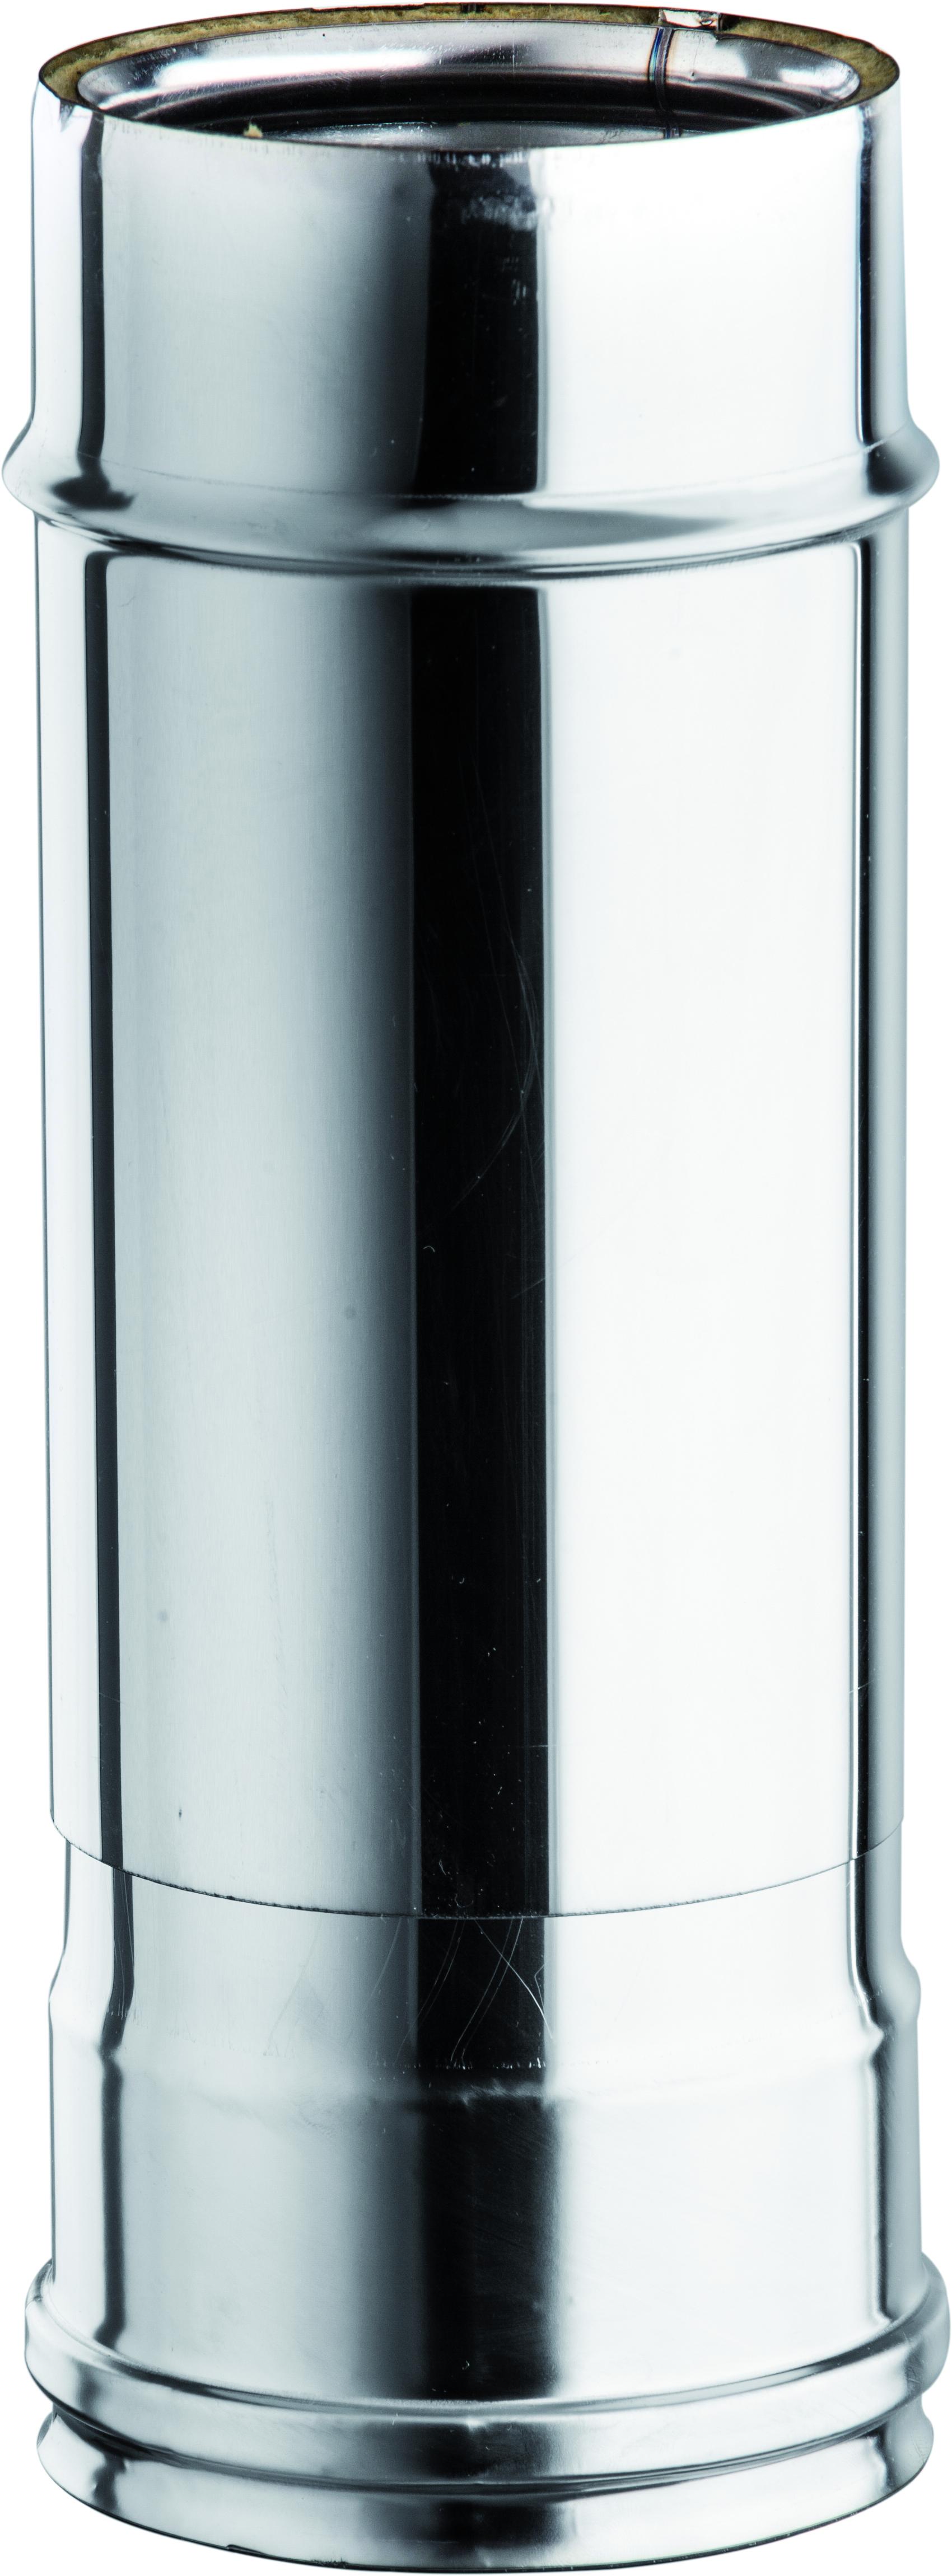 Tuyau en Inox L.1000mm - Warm Tech